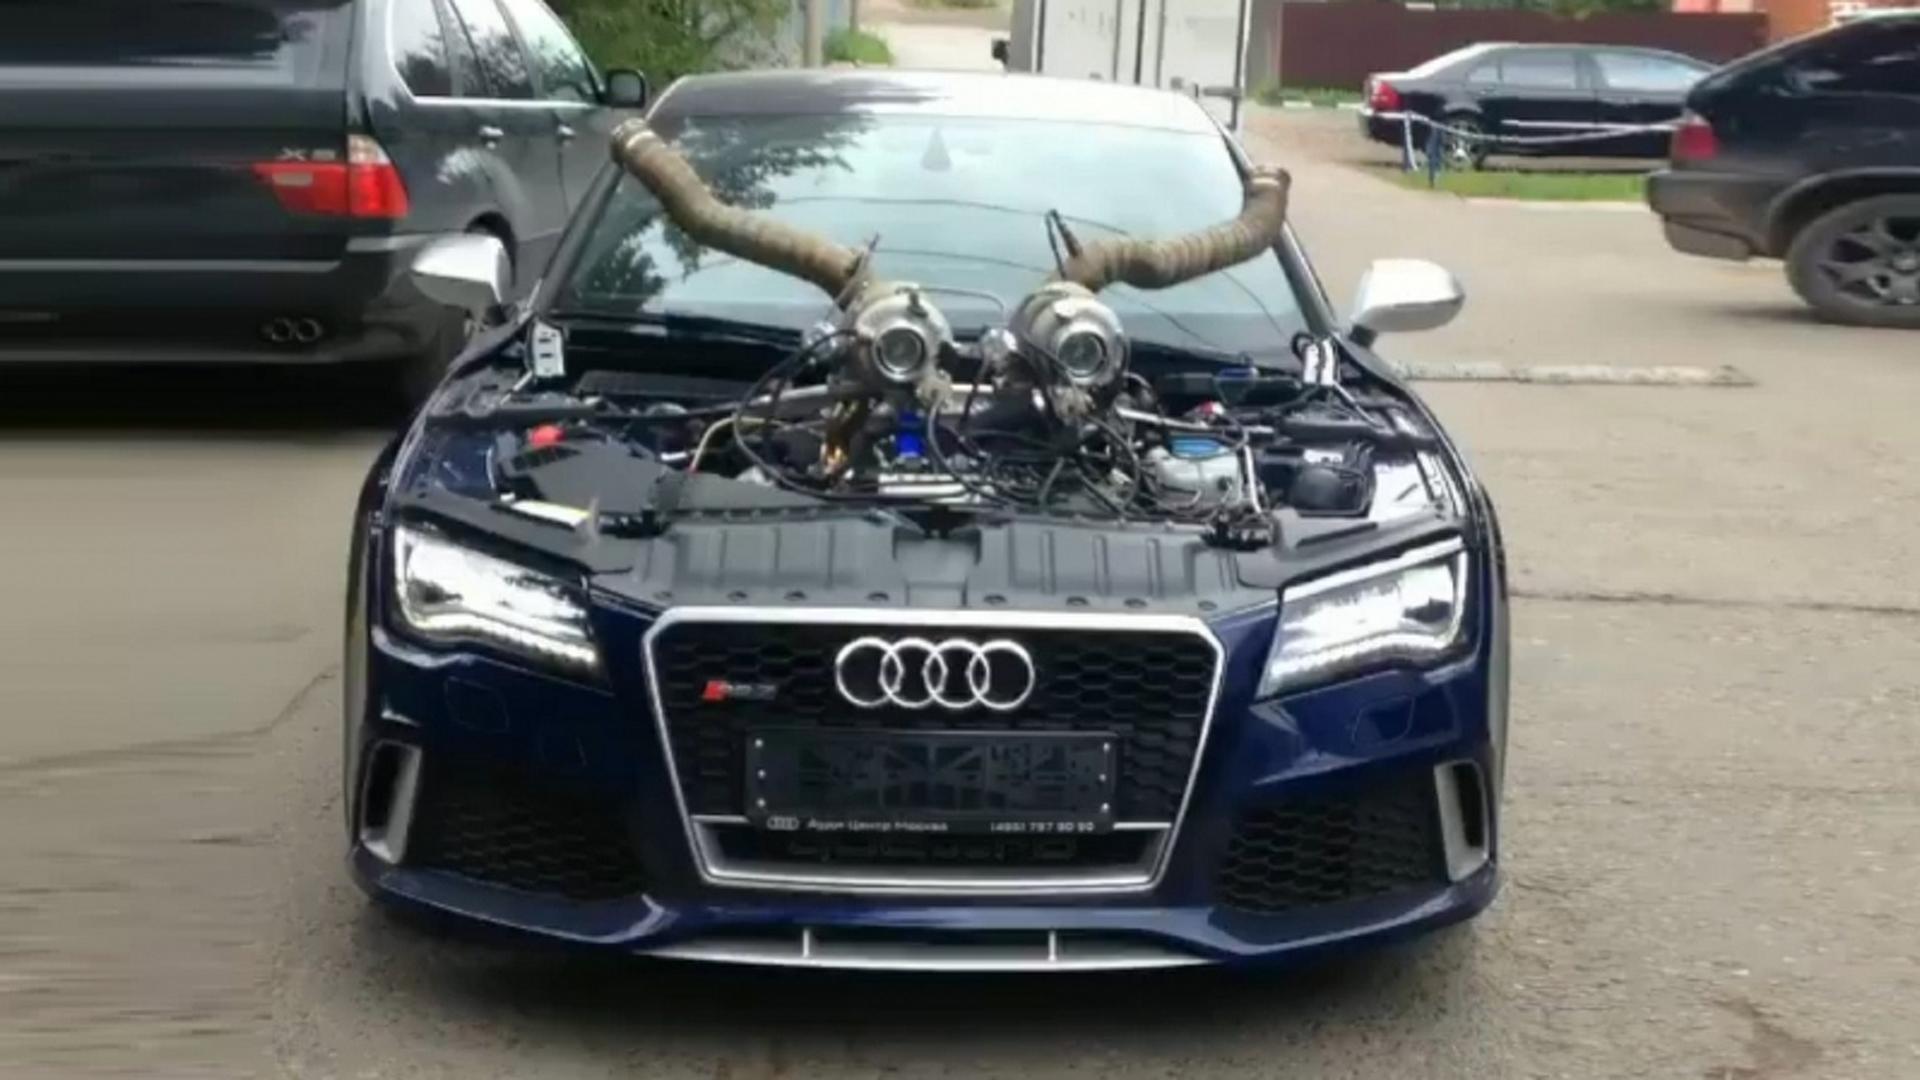 Devil 16 Car Wallpaper Audi Rs7 With 1 200 Hp Could Tempt The Devil